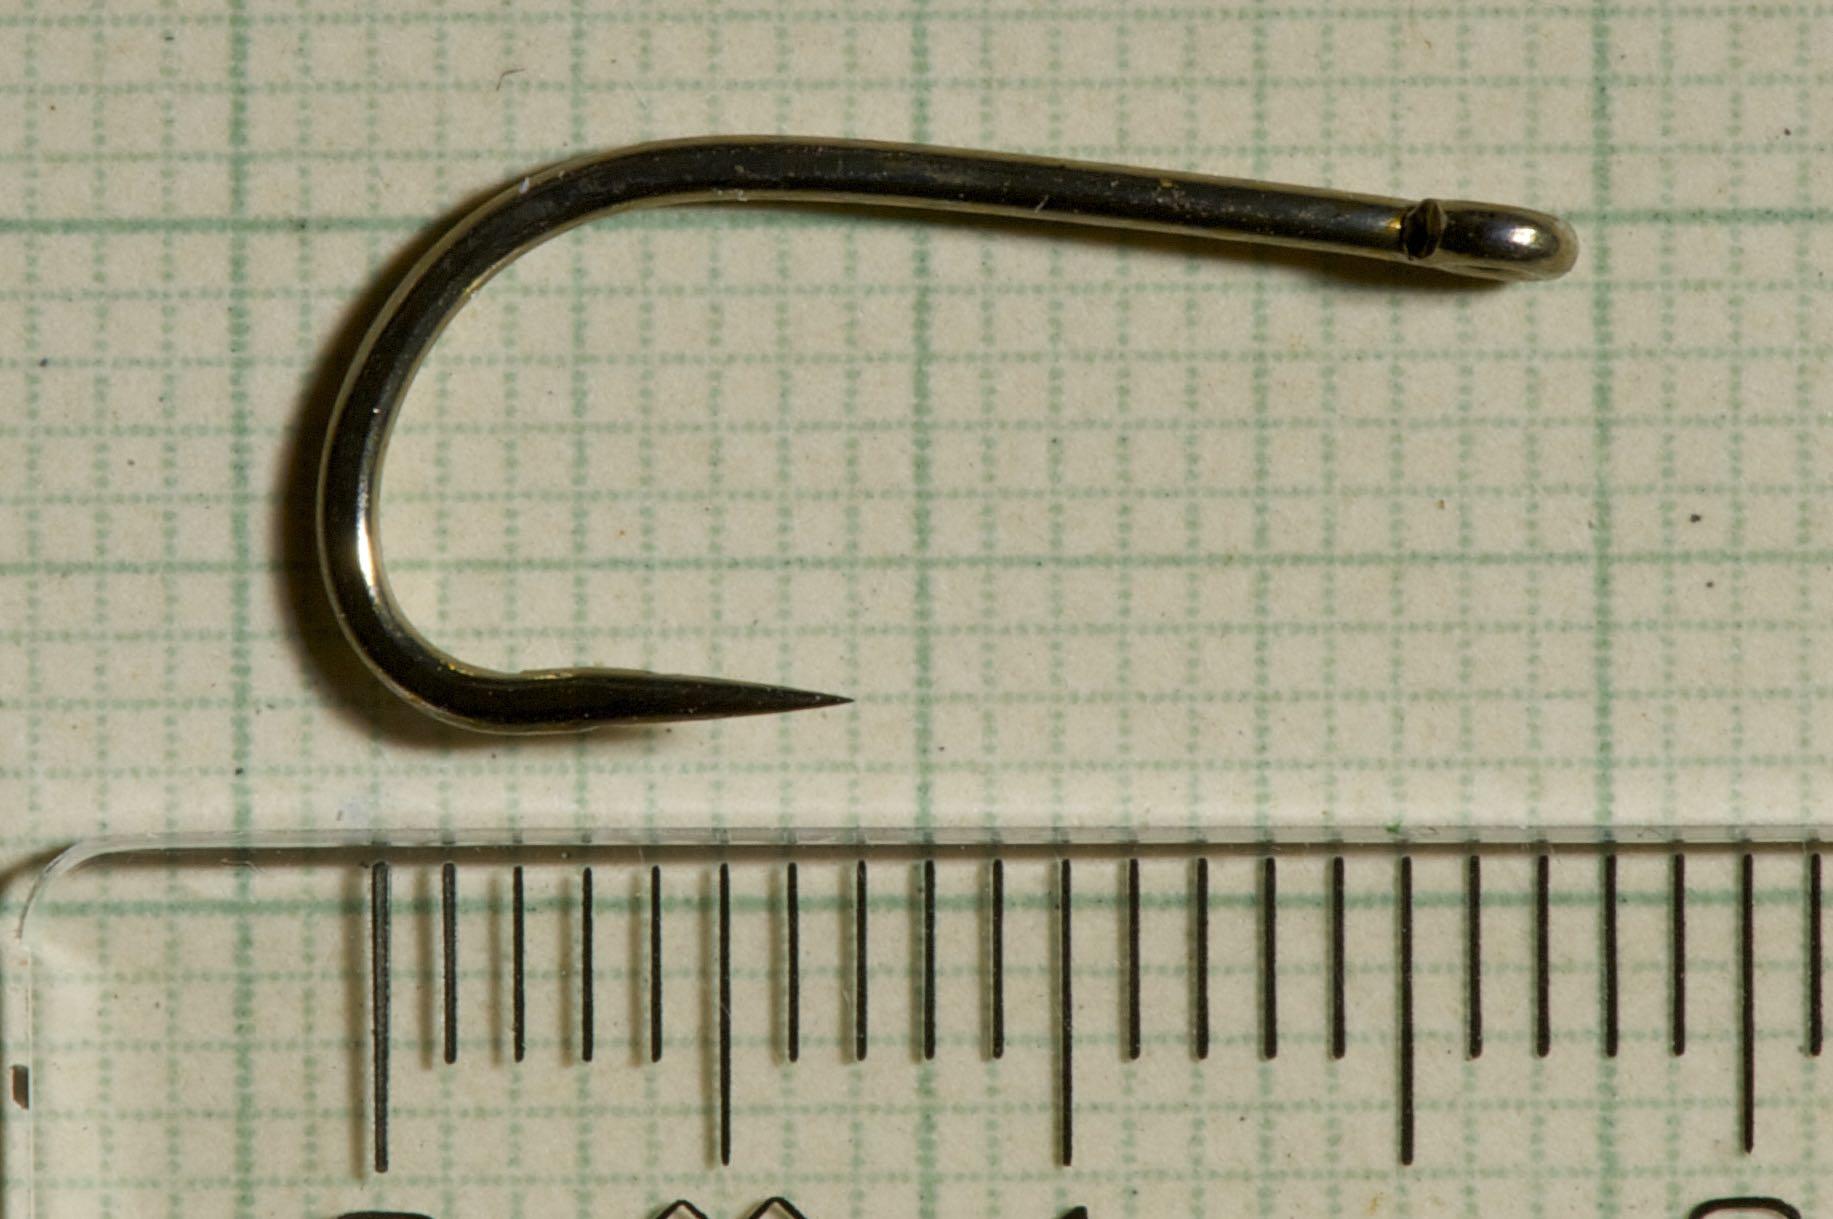 Drennan Barbless Super Specialist size 4...tube fly hook